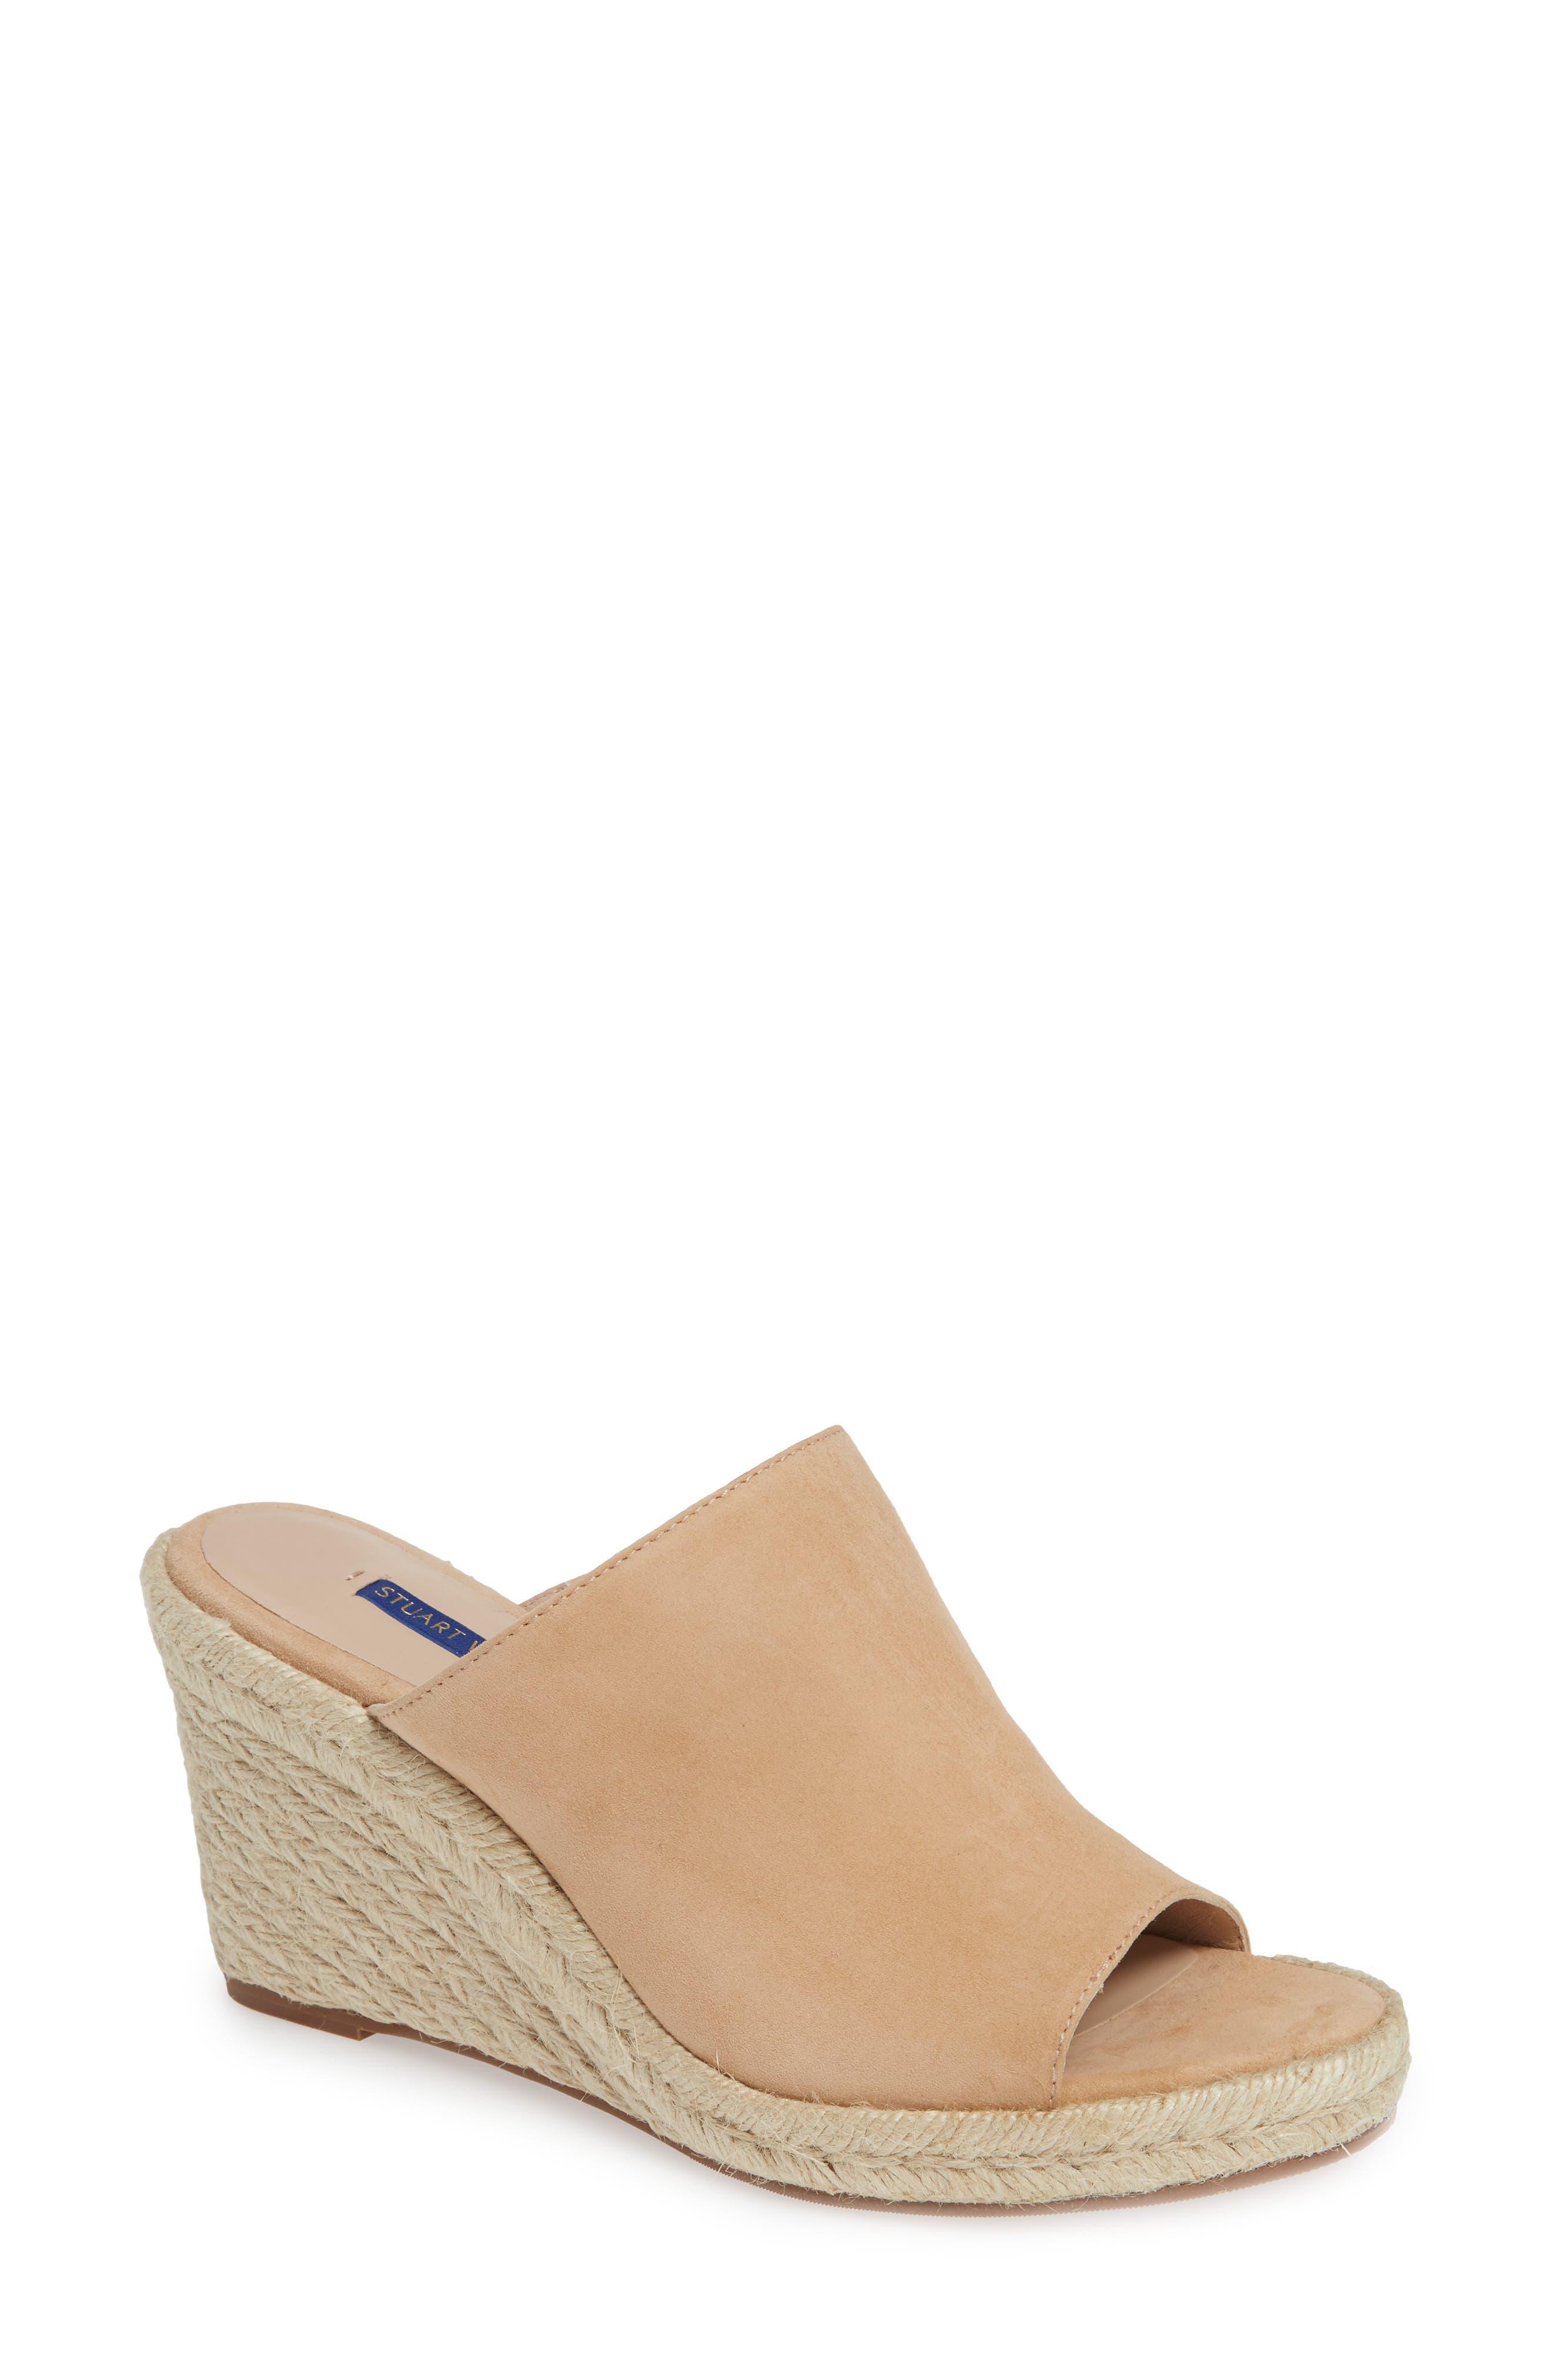 STUART WEITZMAN Marabella Slide Espadrille Sandal, Main, color, ADOBE SUEDE